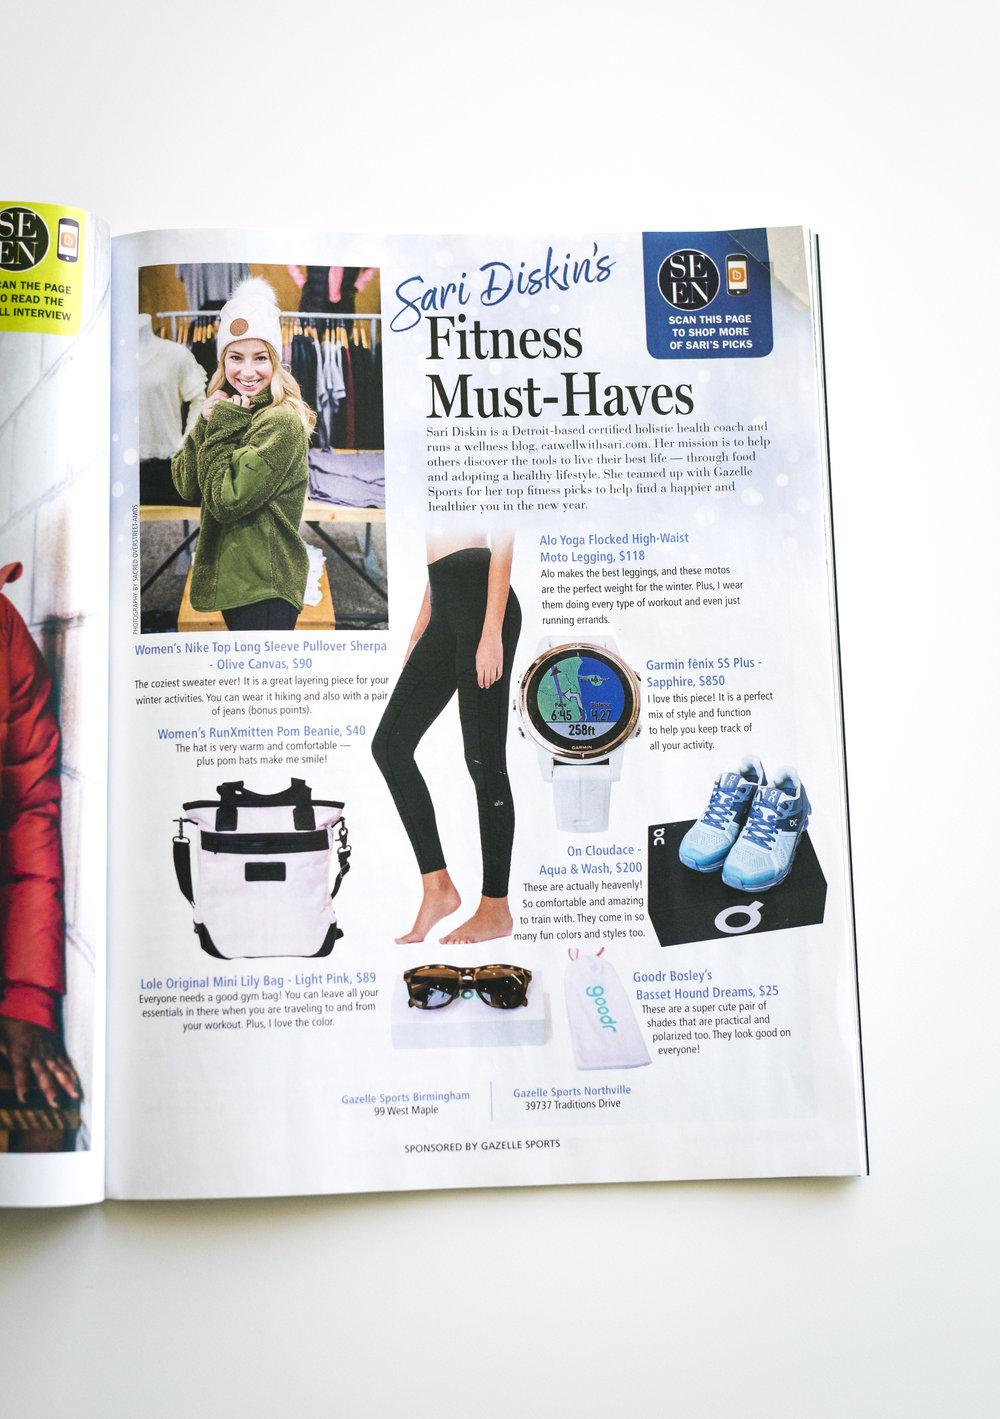 https://seenthemagazine.com/get-seen-magazine/